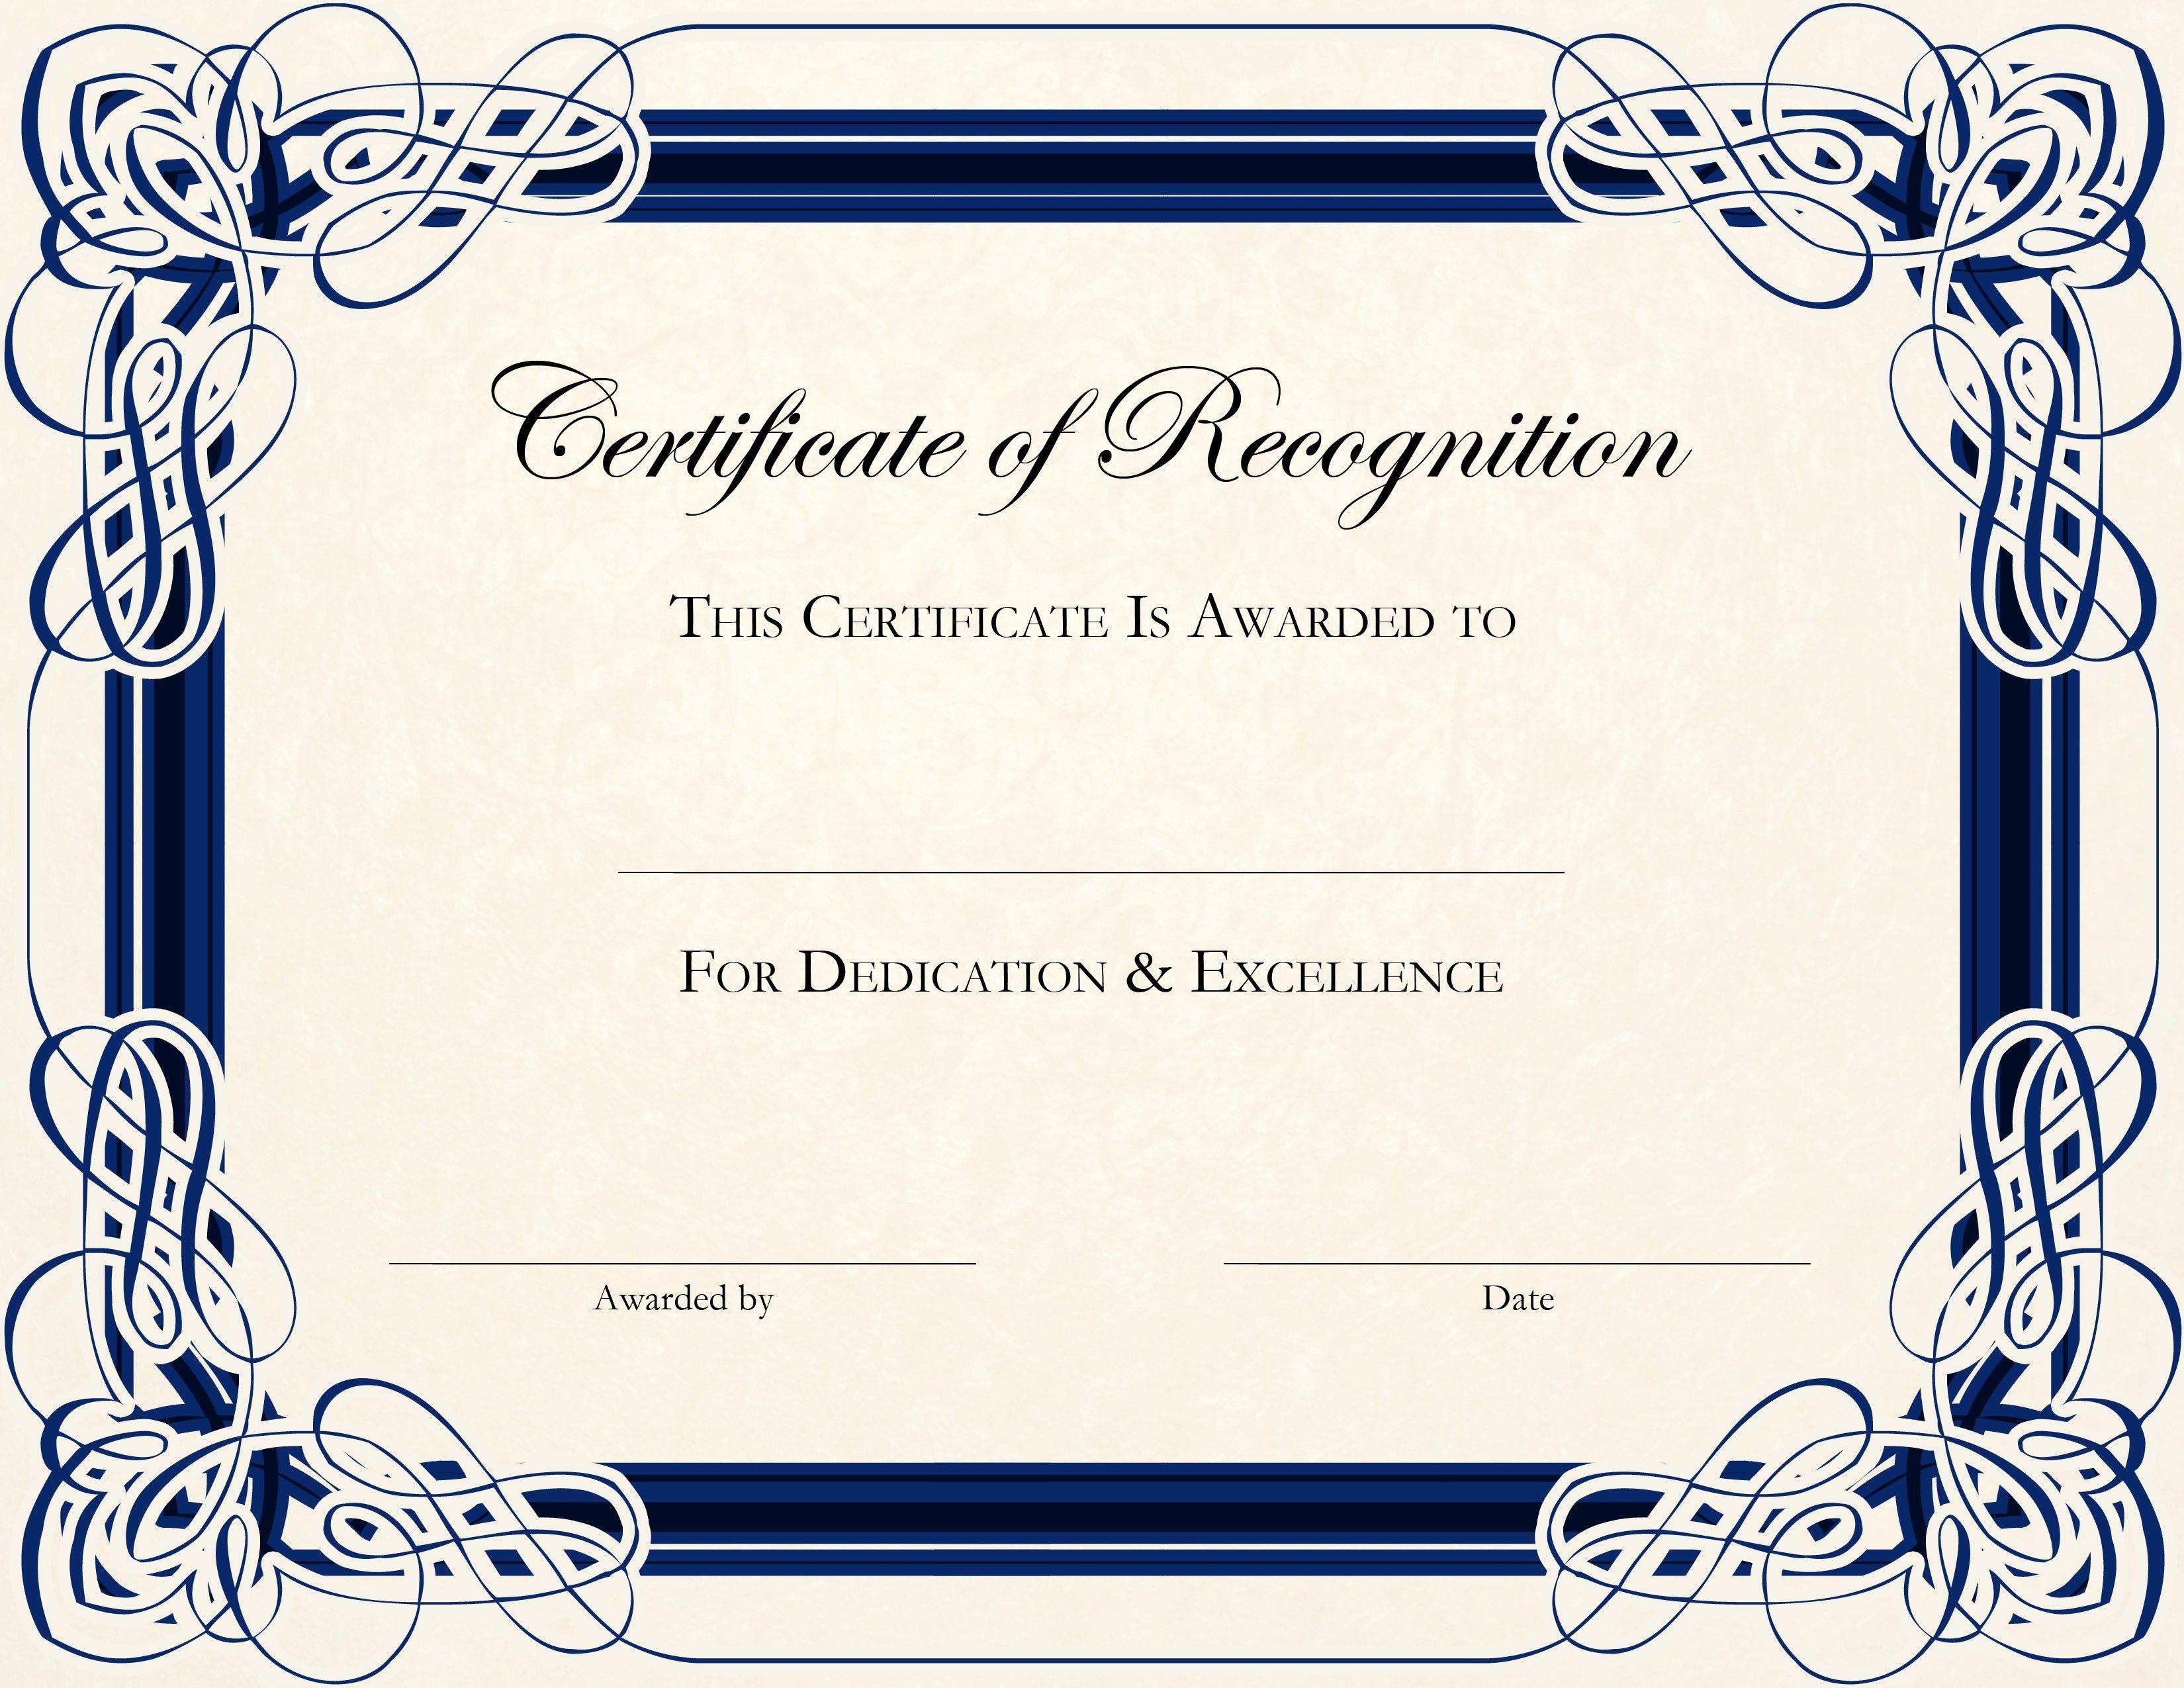 free certificate of deposit template | trattorialeondoro